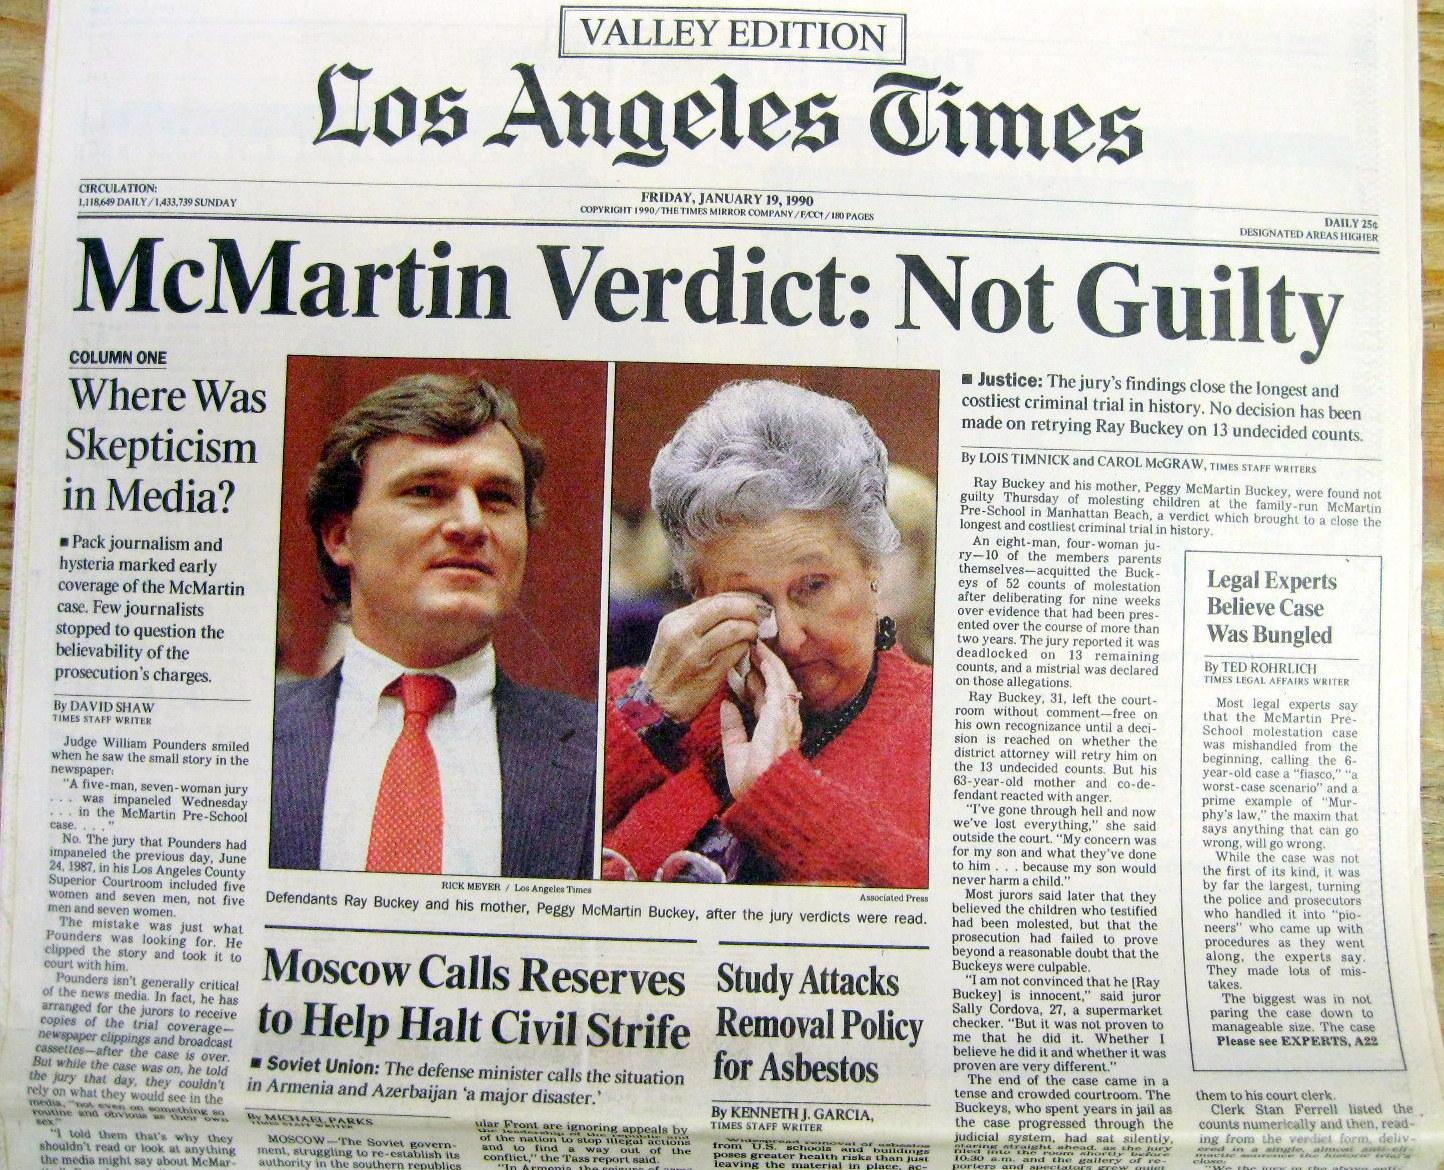 crucible and mcmartin trials